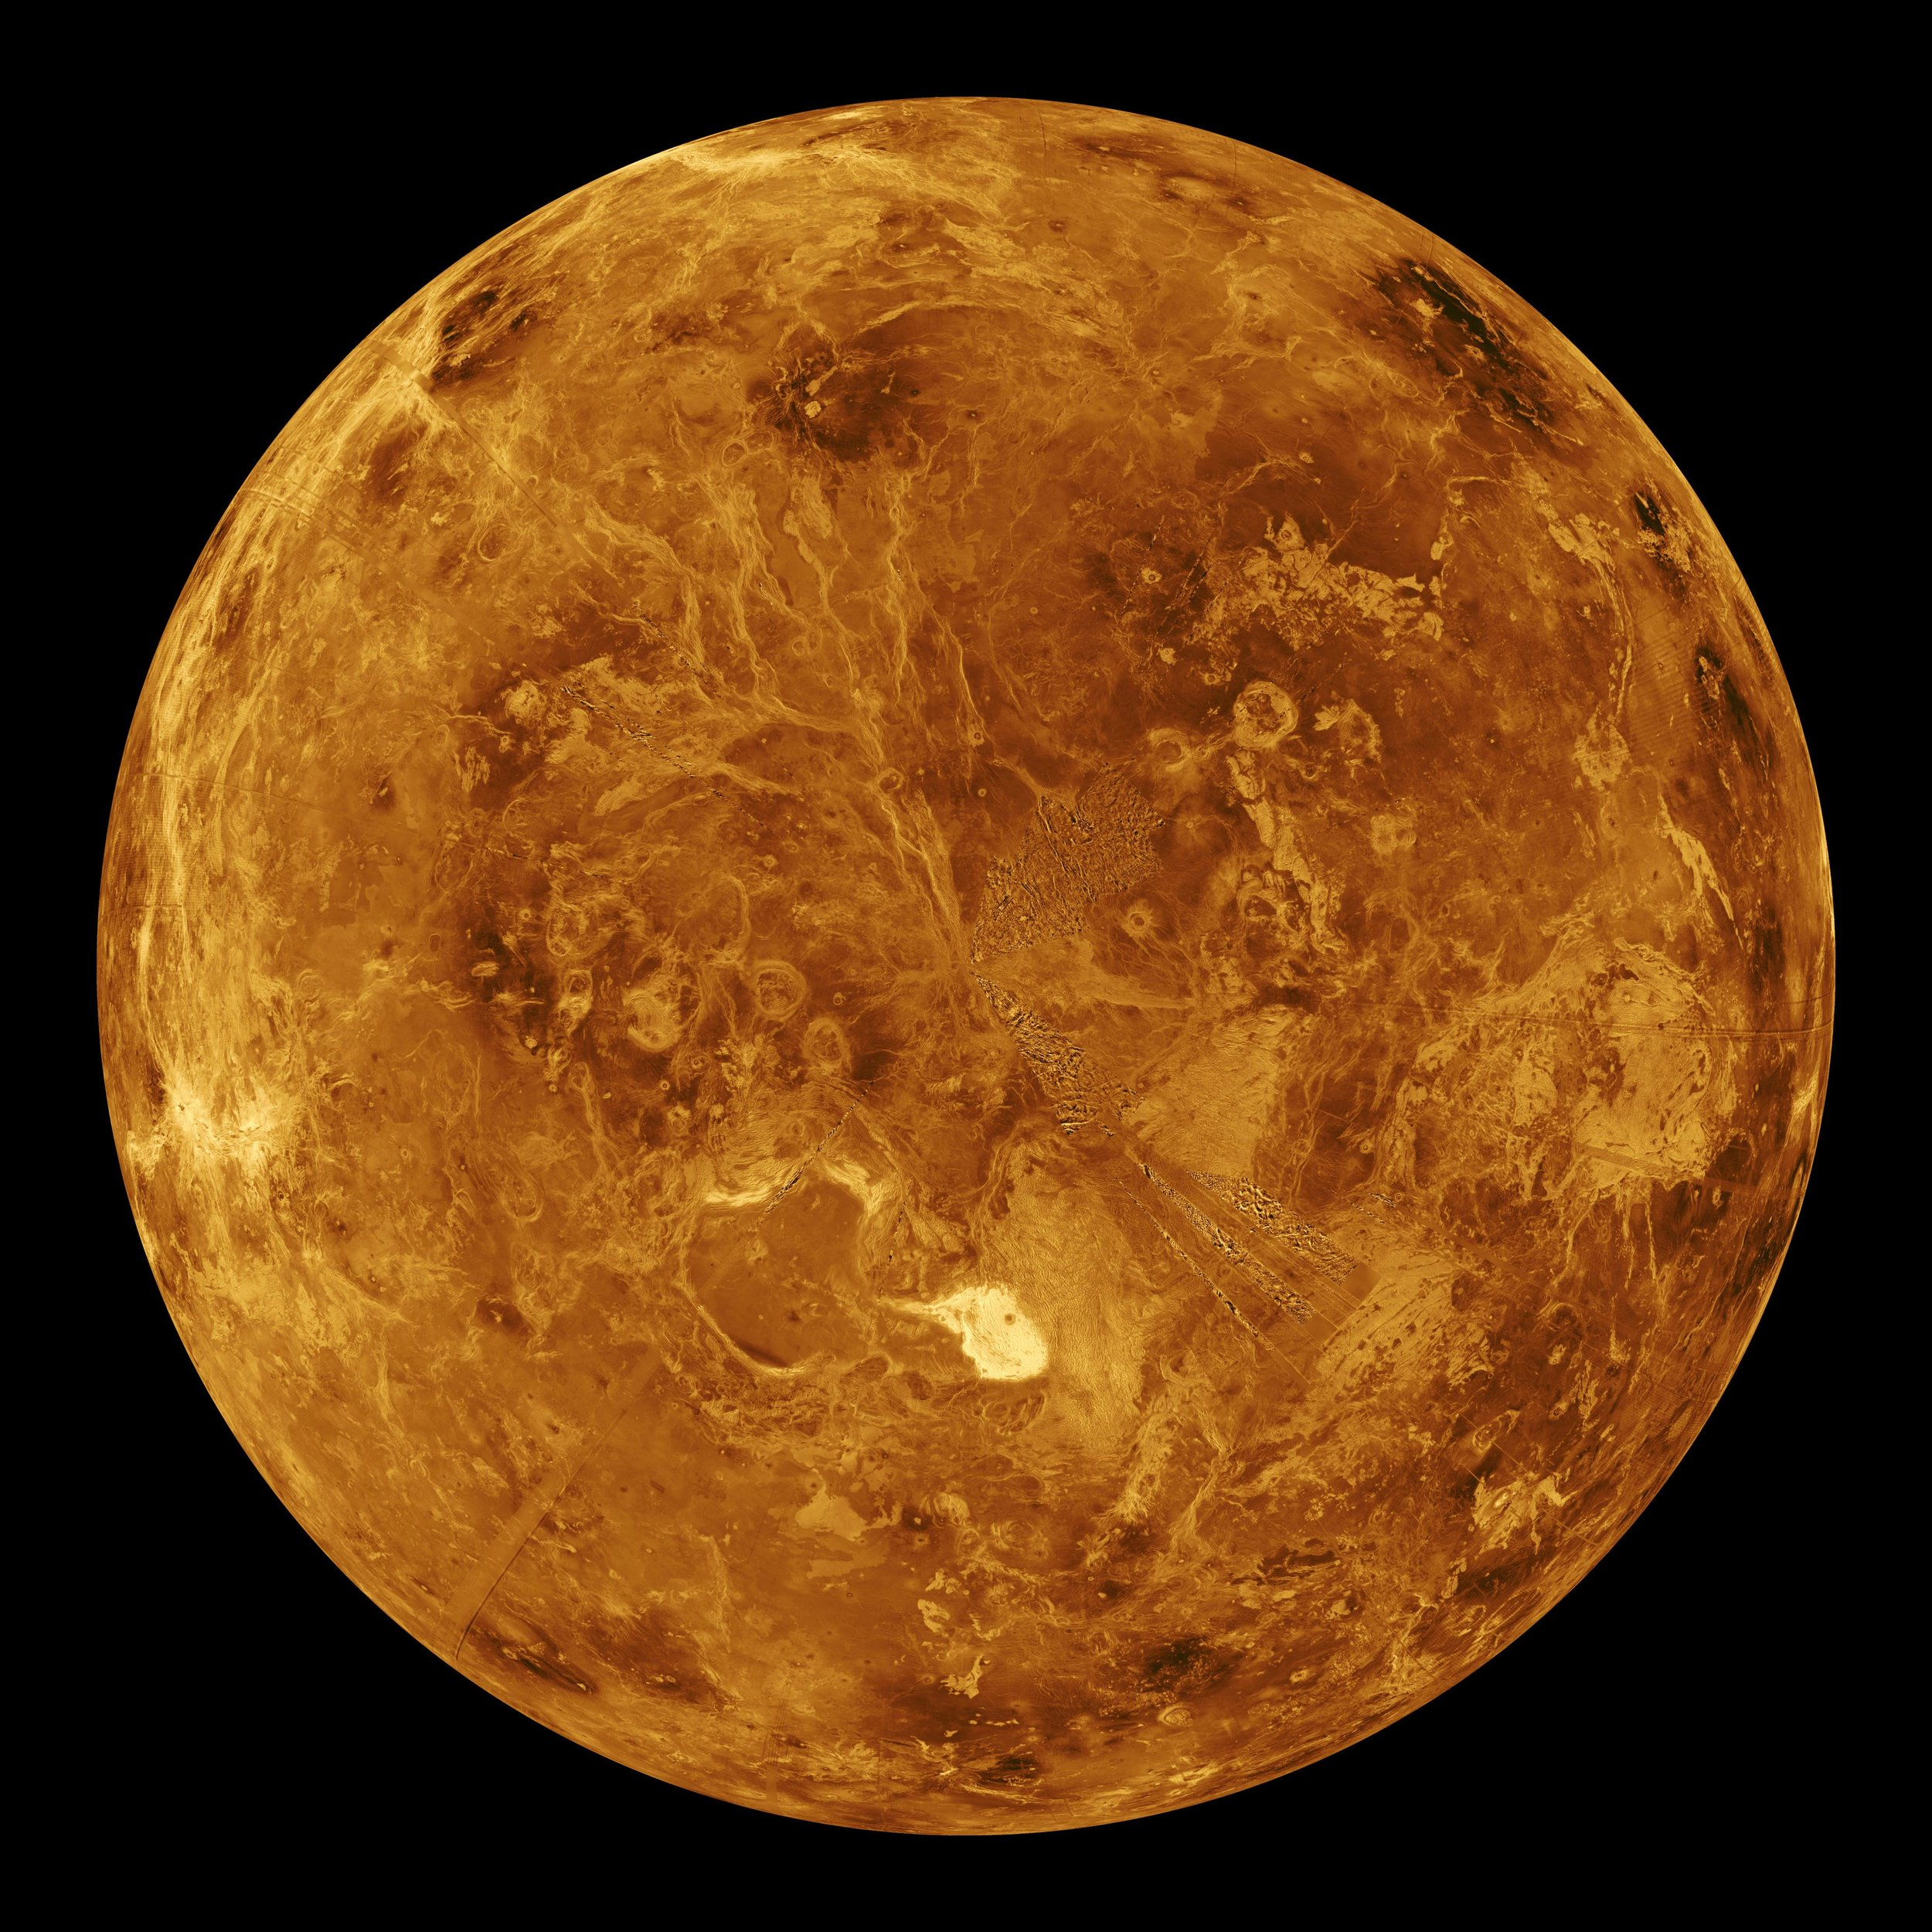 Image of Venus courtesy of NASA/JPL